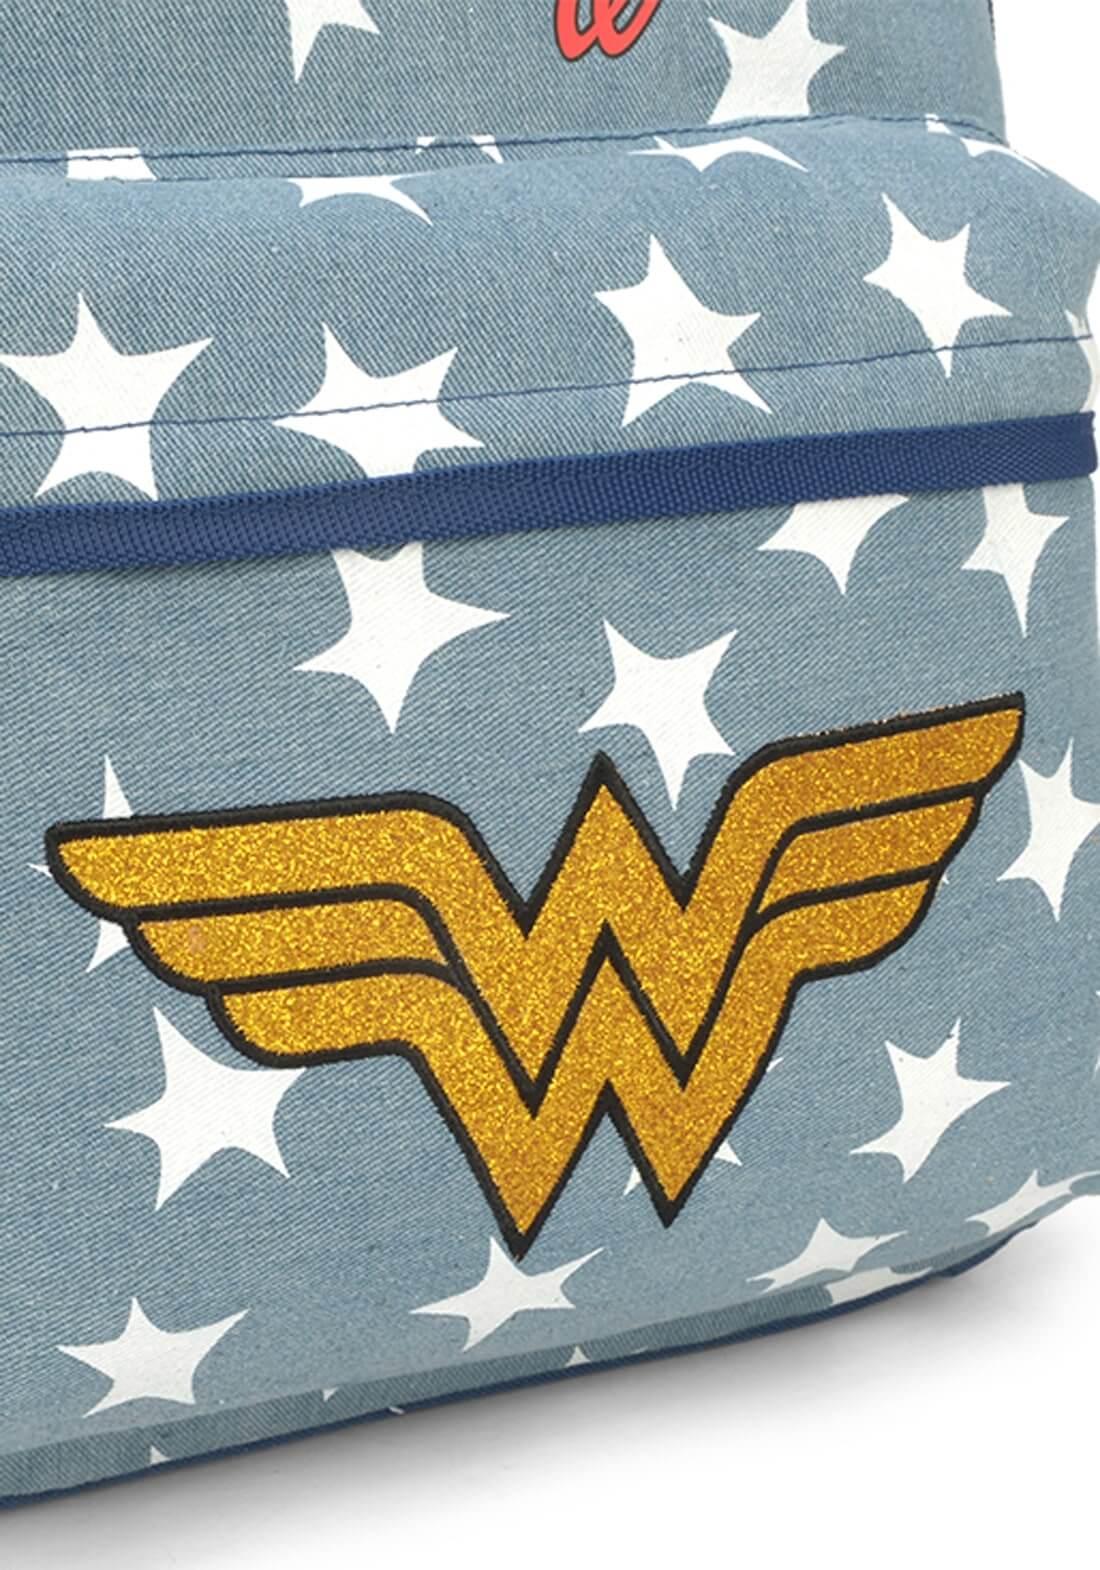 Mochila Mulher Maravilha Wonder Woman Notebook Jeans Bottons